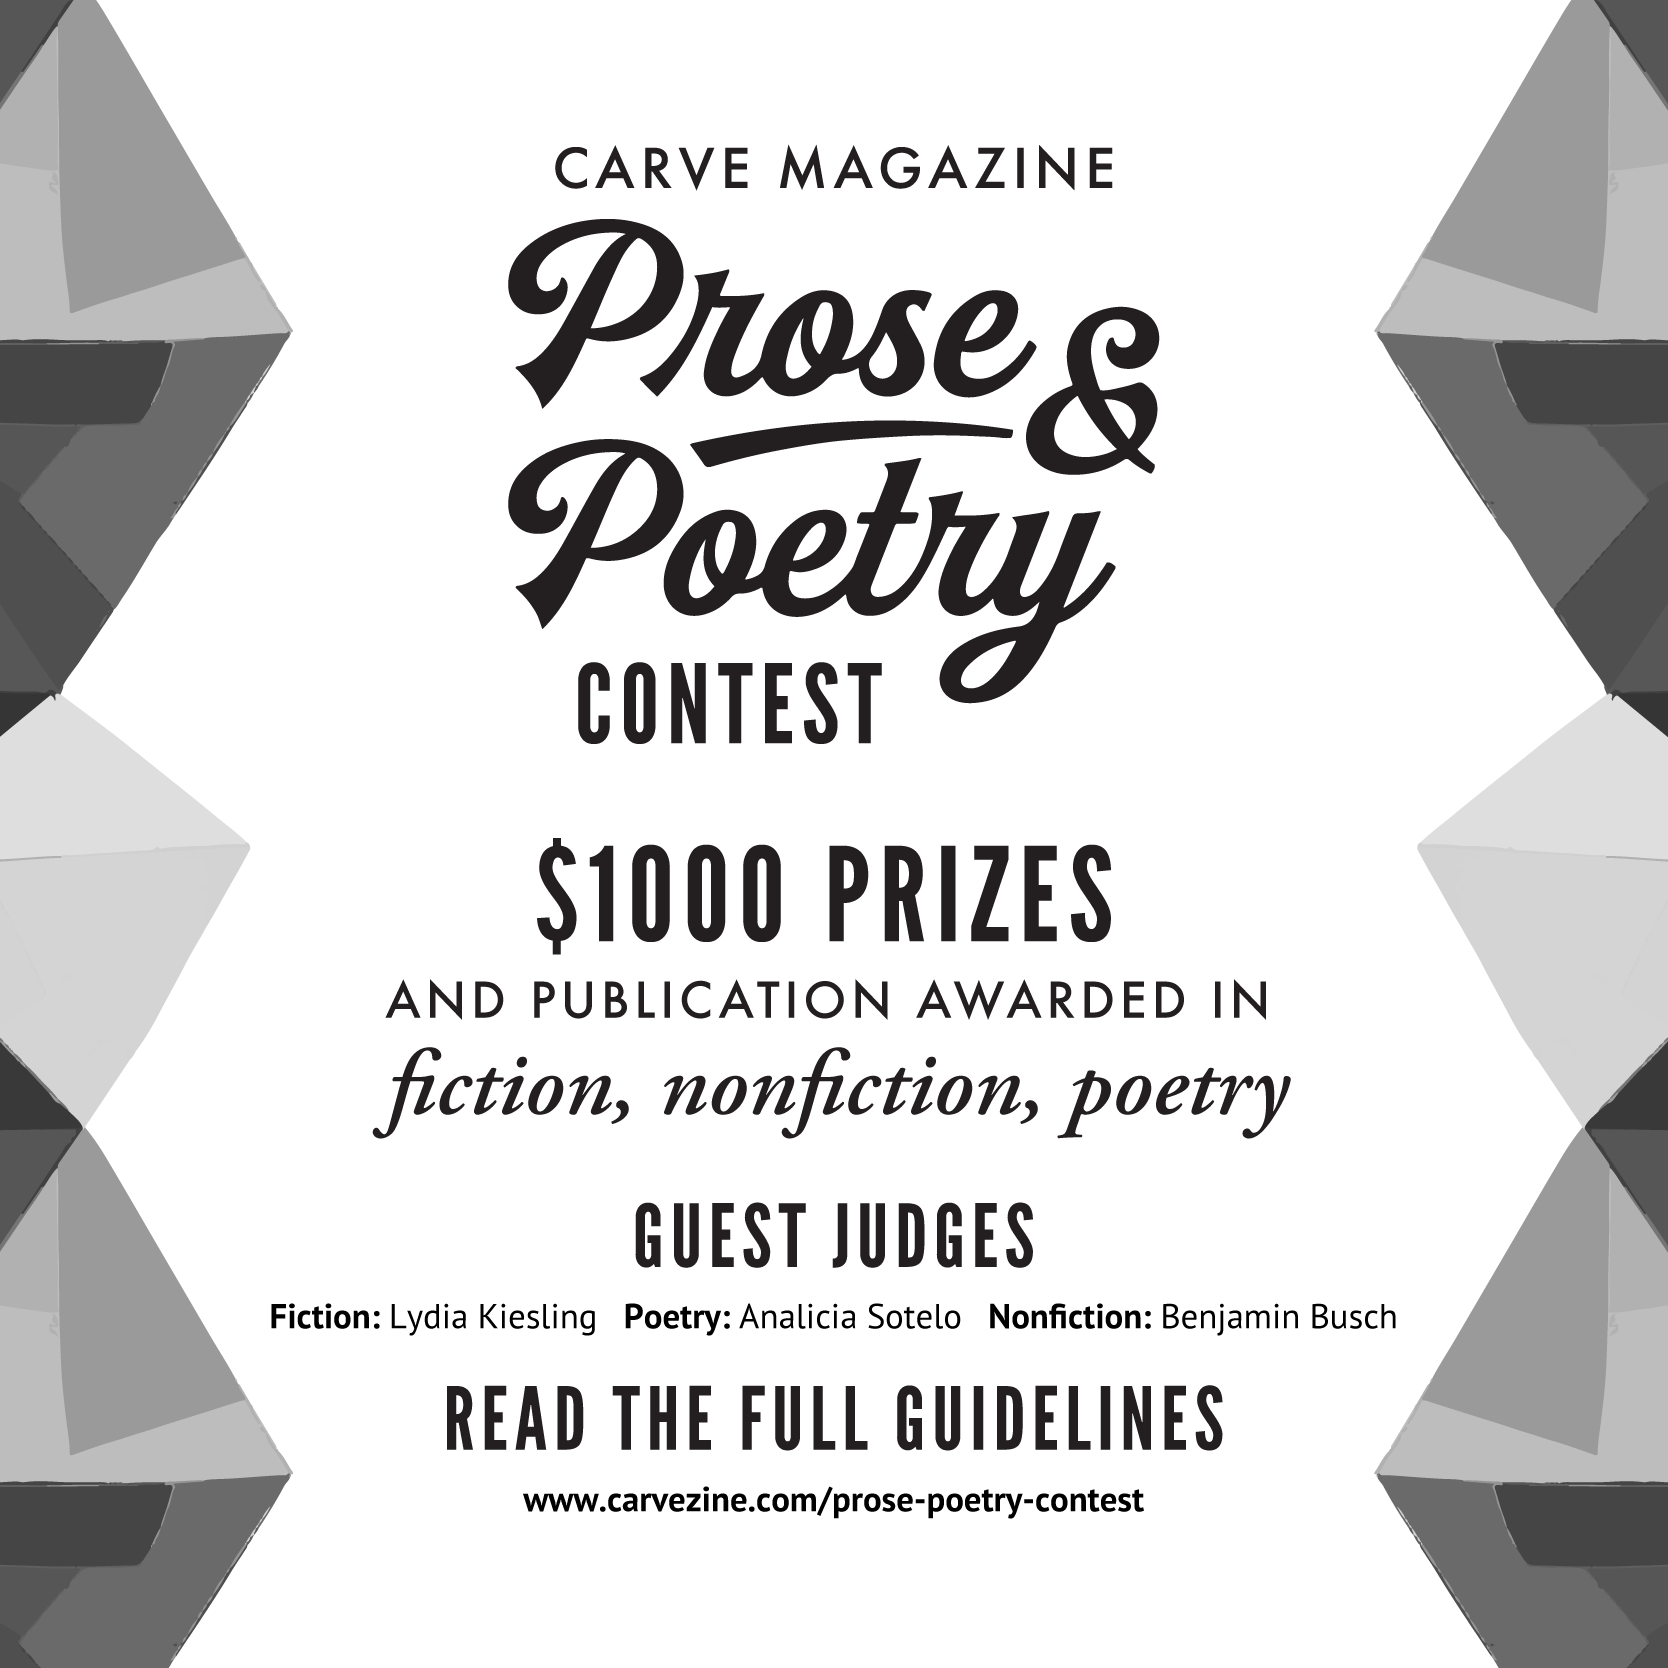 Carve Magazine Prose & Poetry Contest